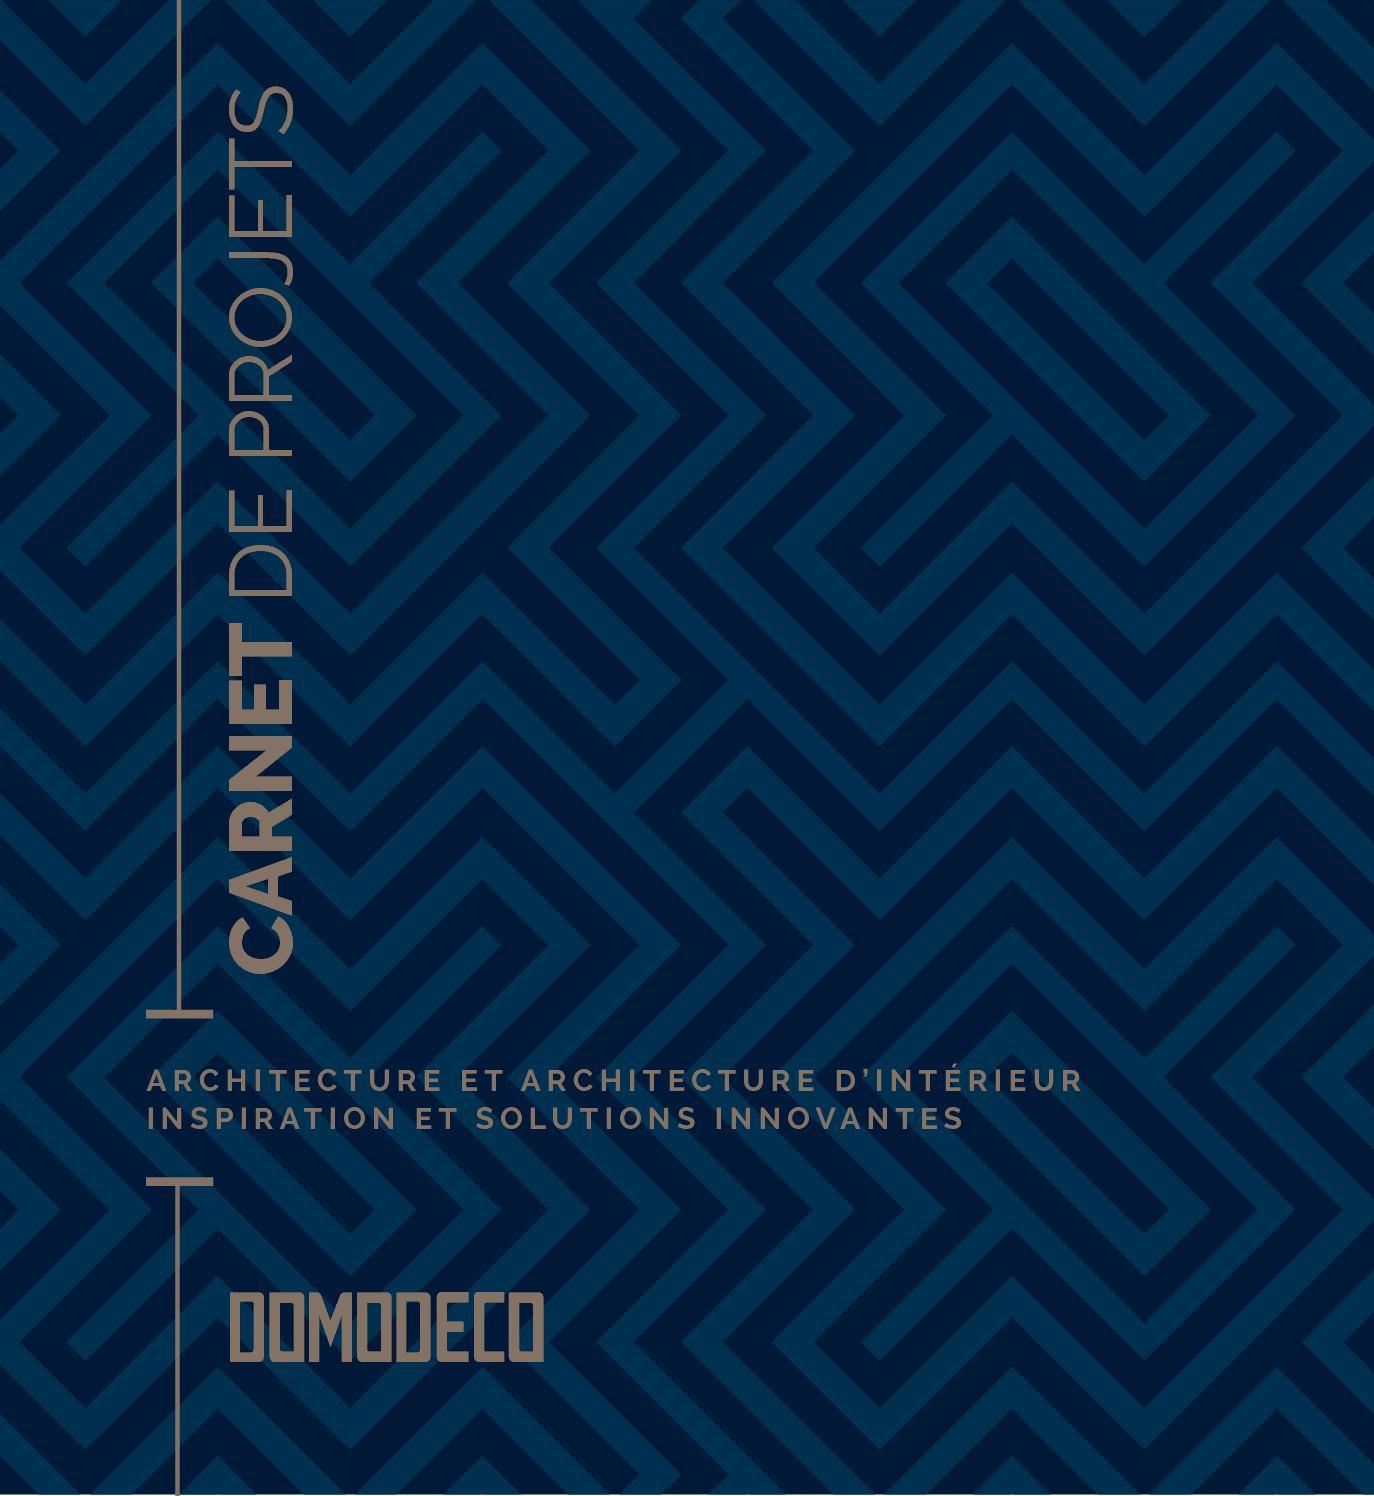 a368a63101a79d Calaméo - Carnet Projets By Domodeco - N°1